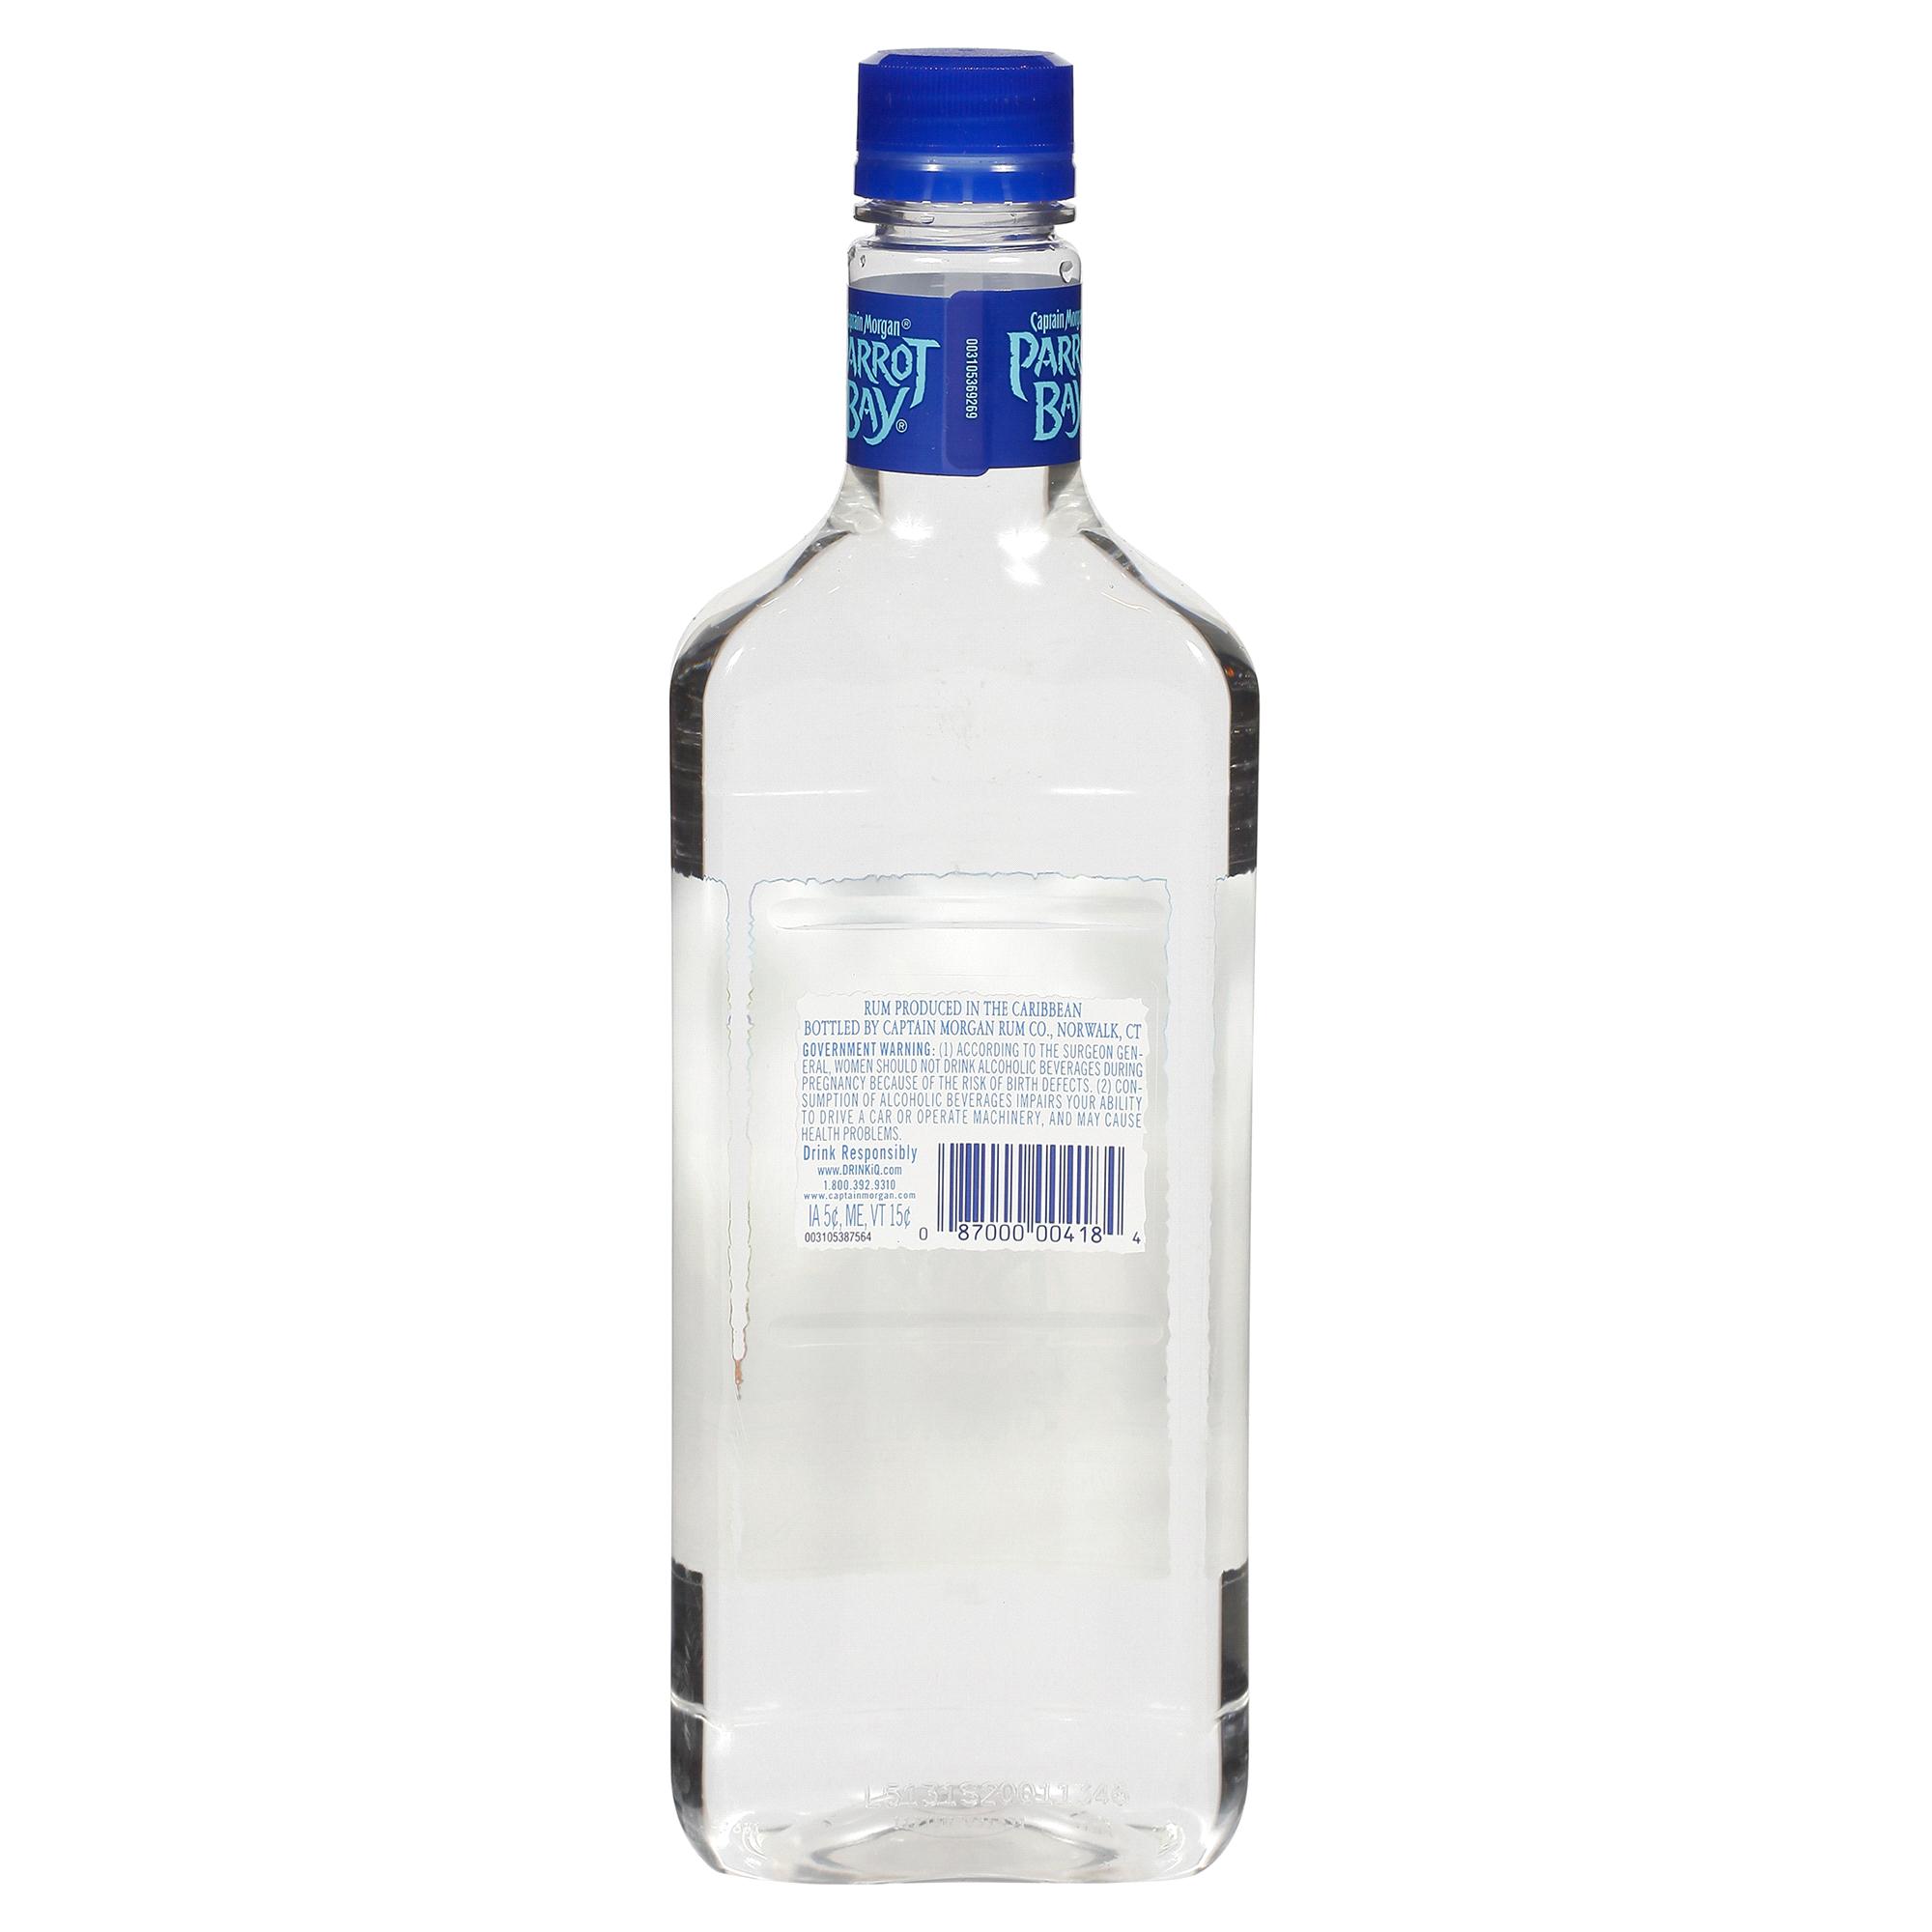 Captain Morgan Parrot Bay Coconut Rum 750 ml